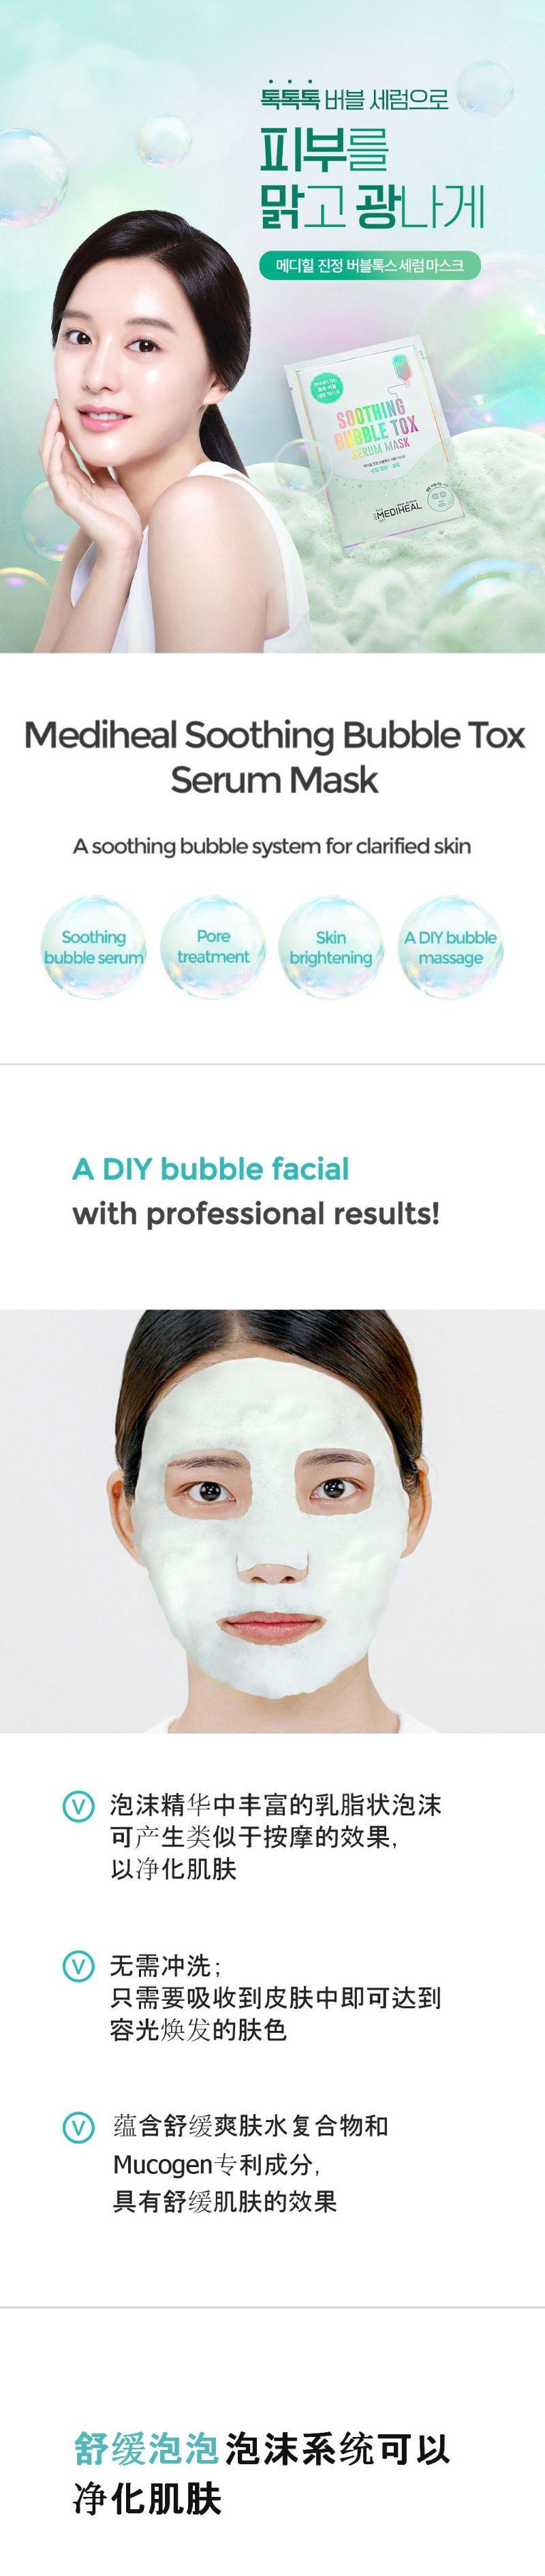 Mediheal Soothing Bubble Tox Serum Mask (18ml x 10ea) D01-1.jpg